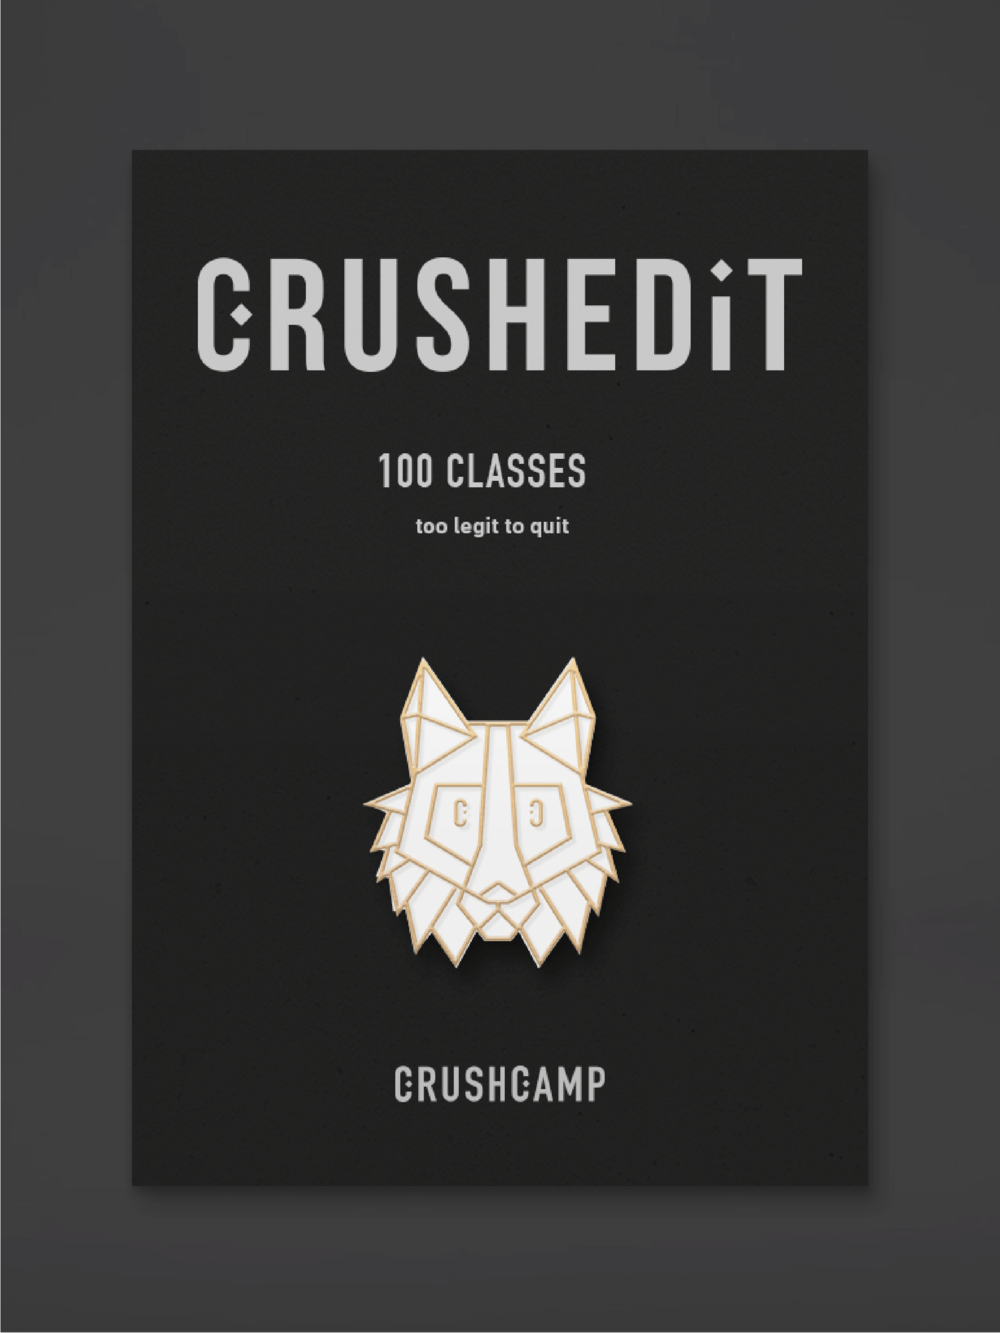 CrushCamp Graphic Design | Trout + Taylor www.troutandtaylor.com